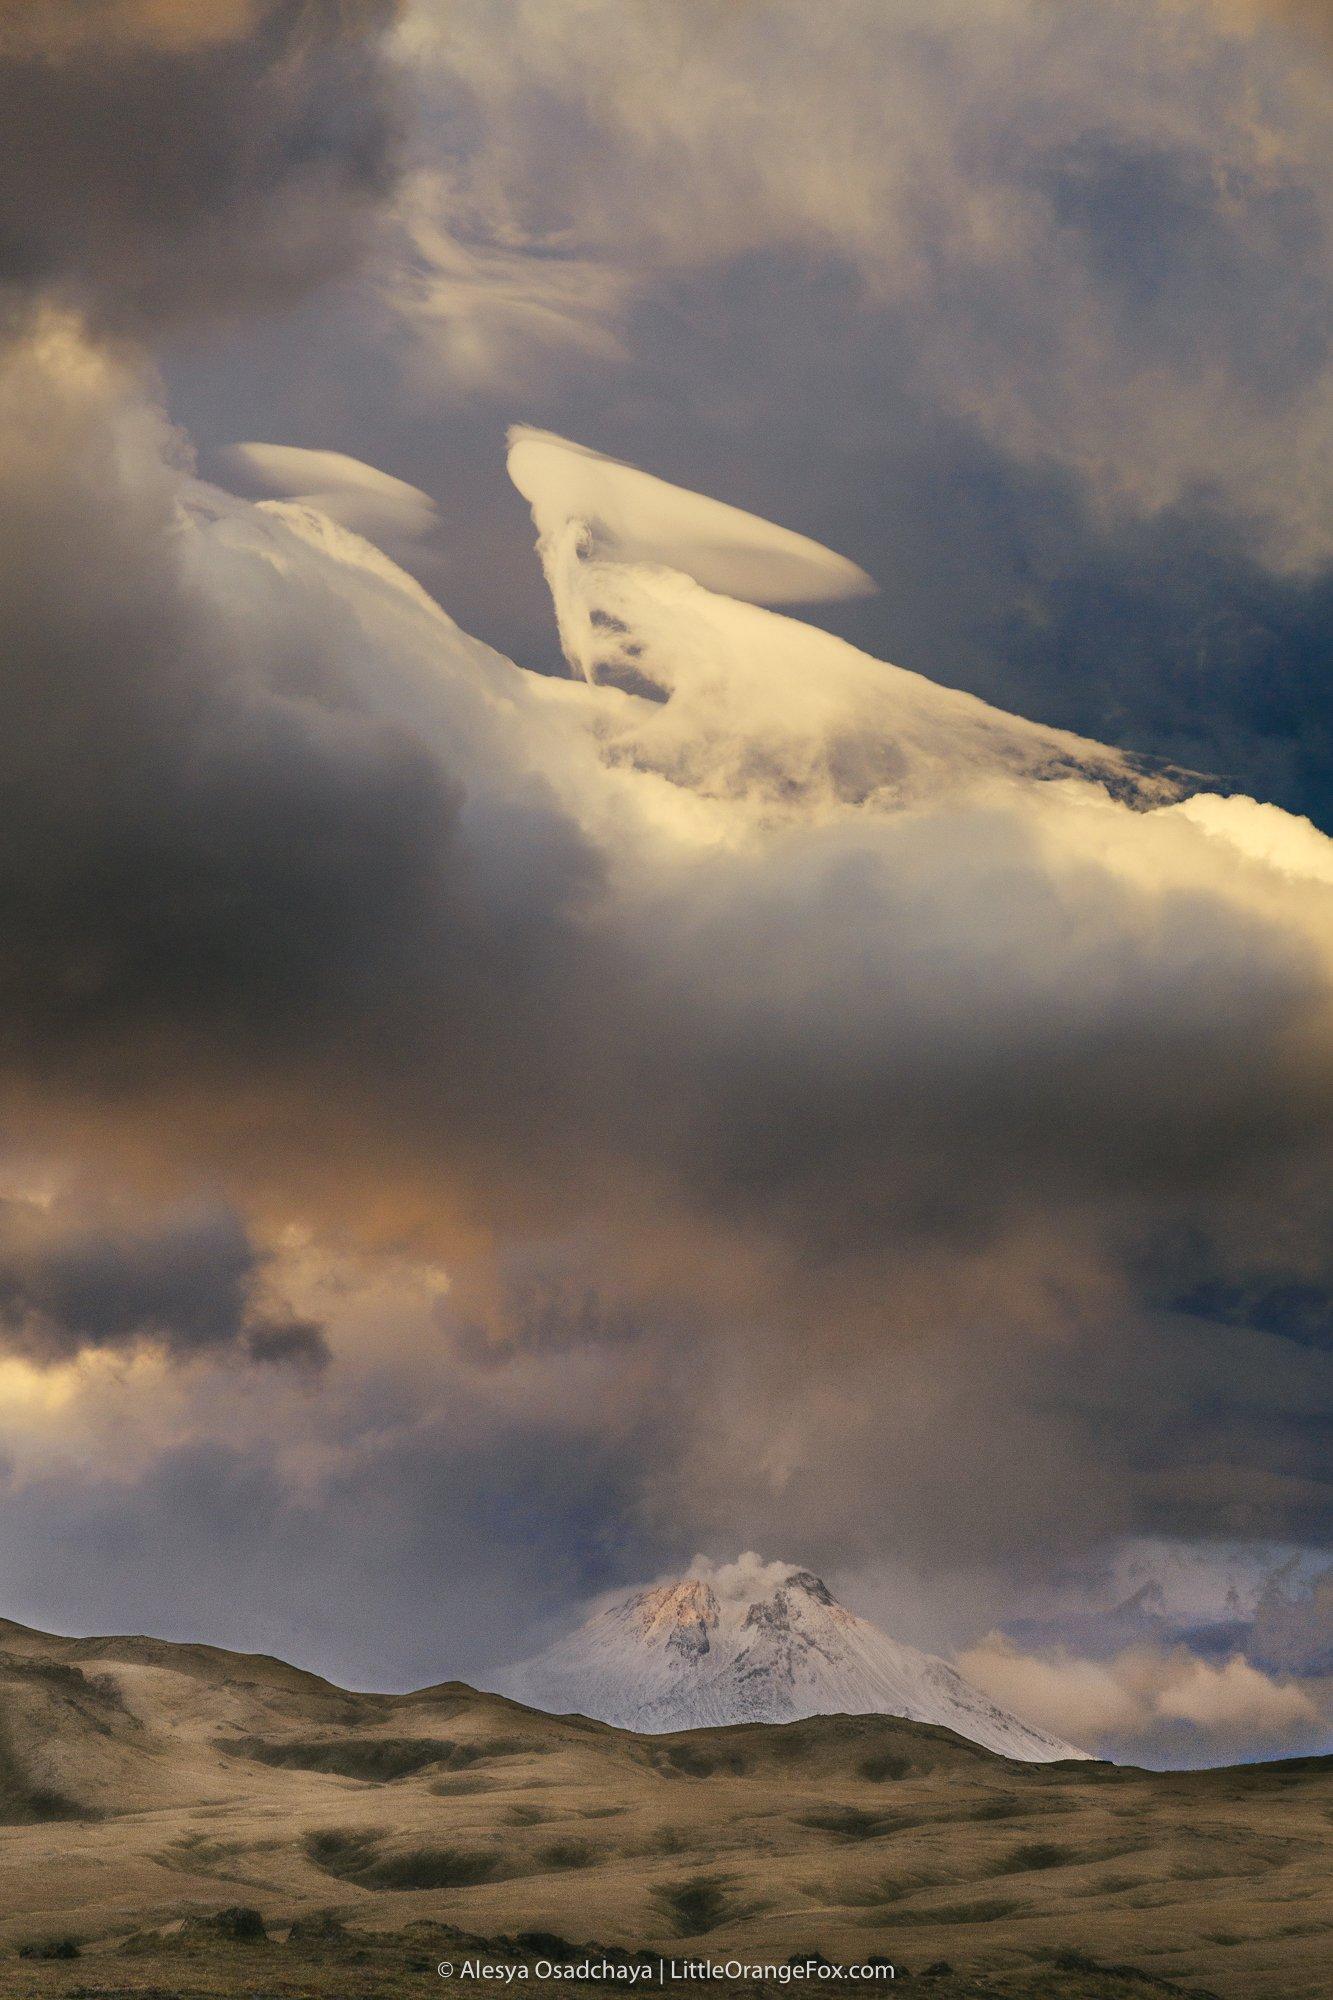 камчатка, облако, закат, вулканы, Осадчая Алеся